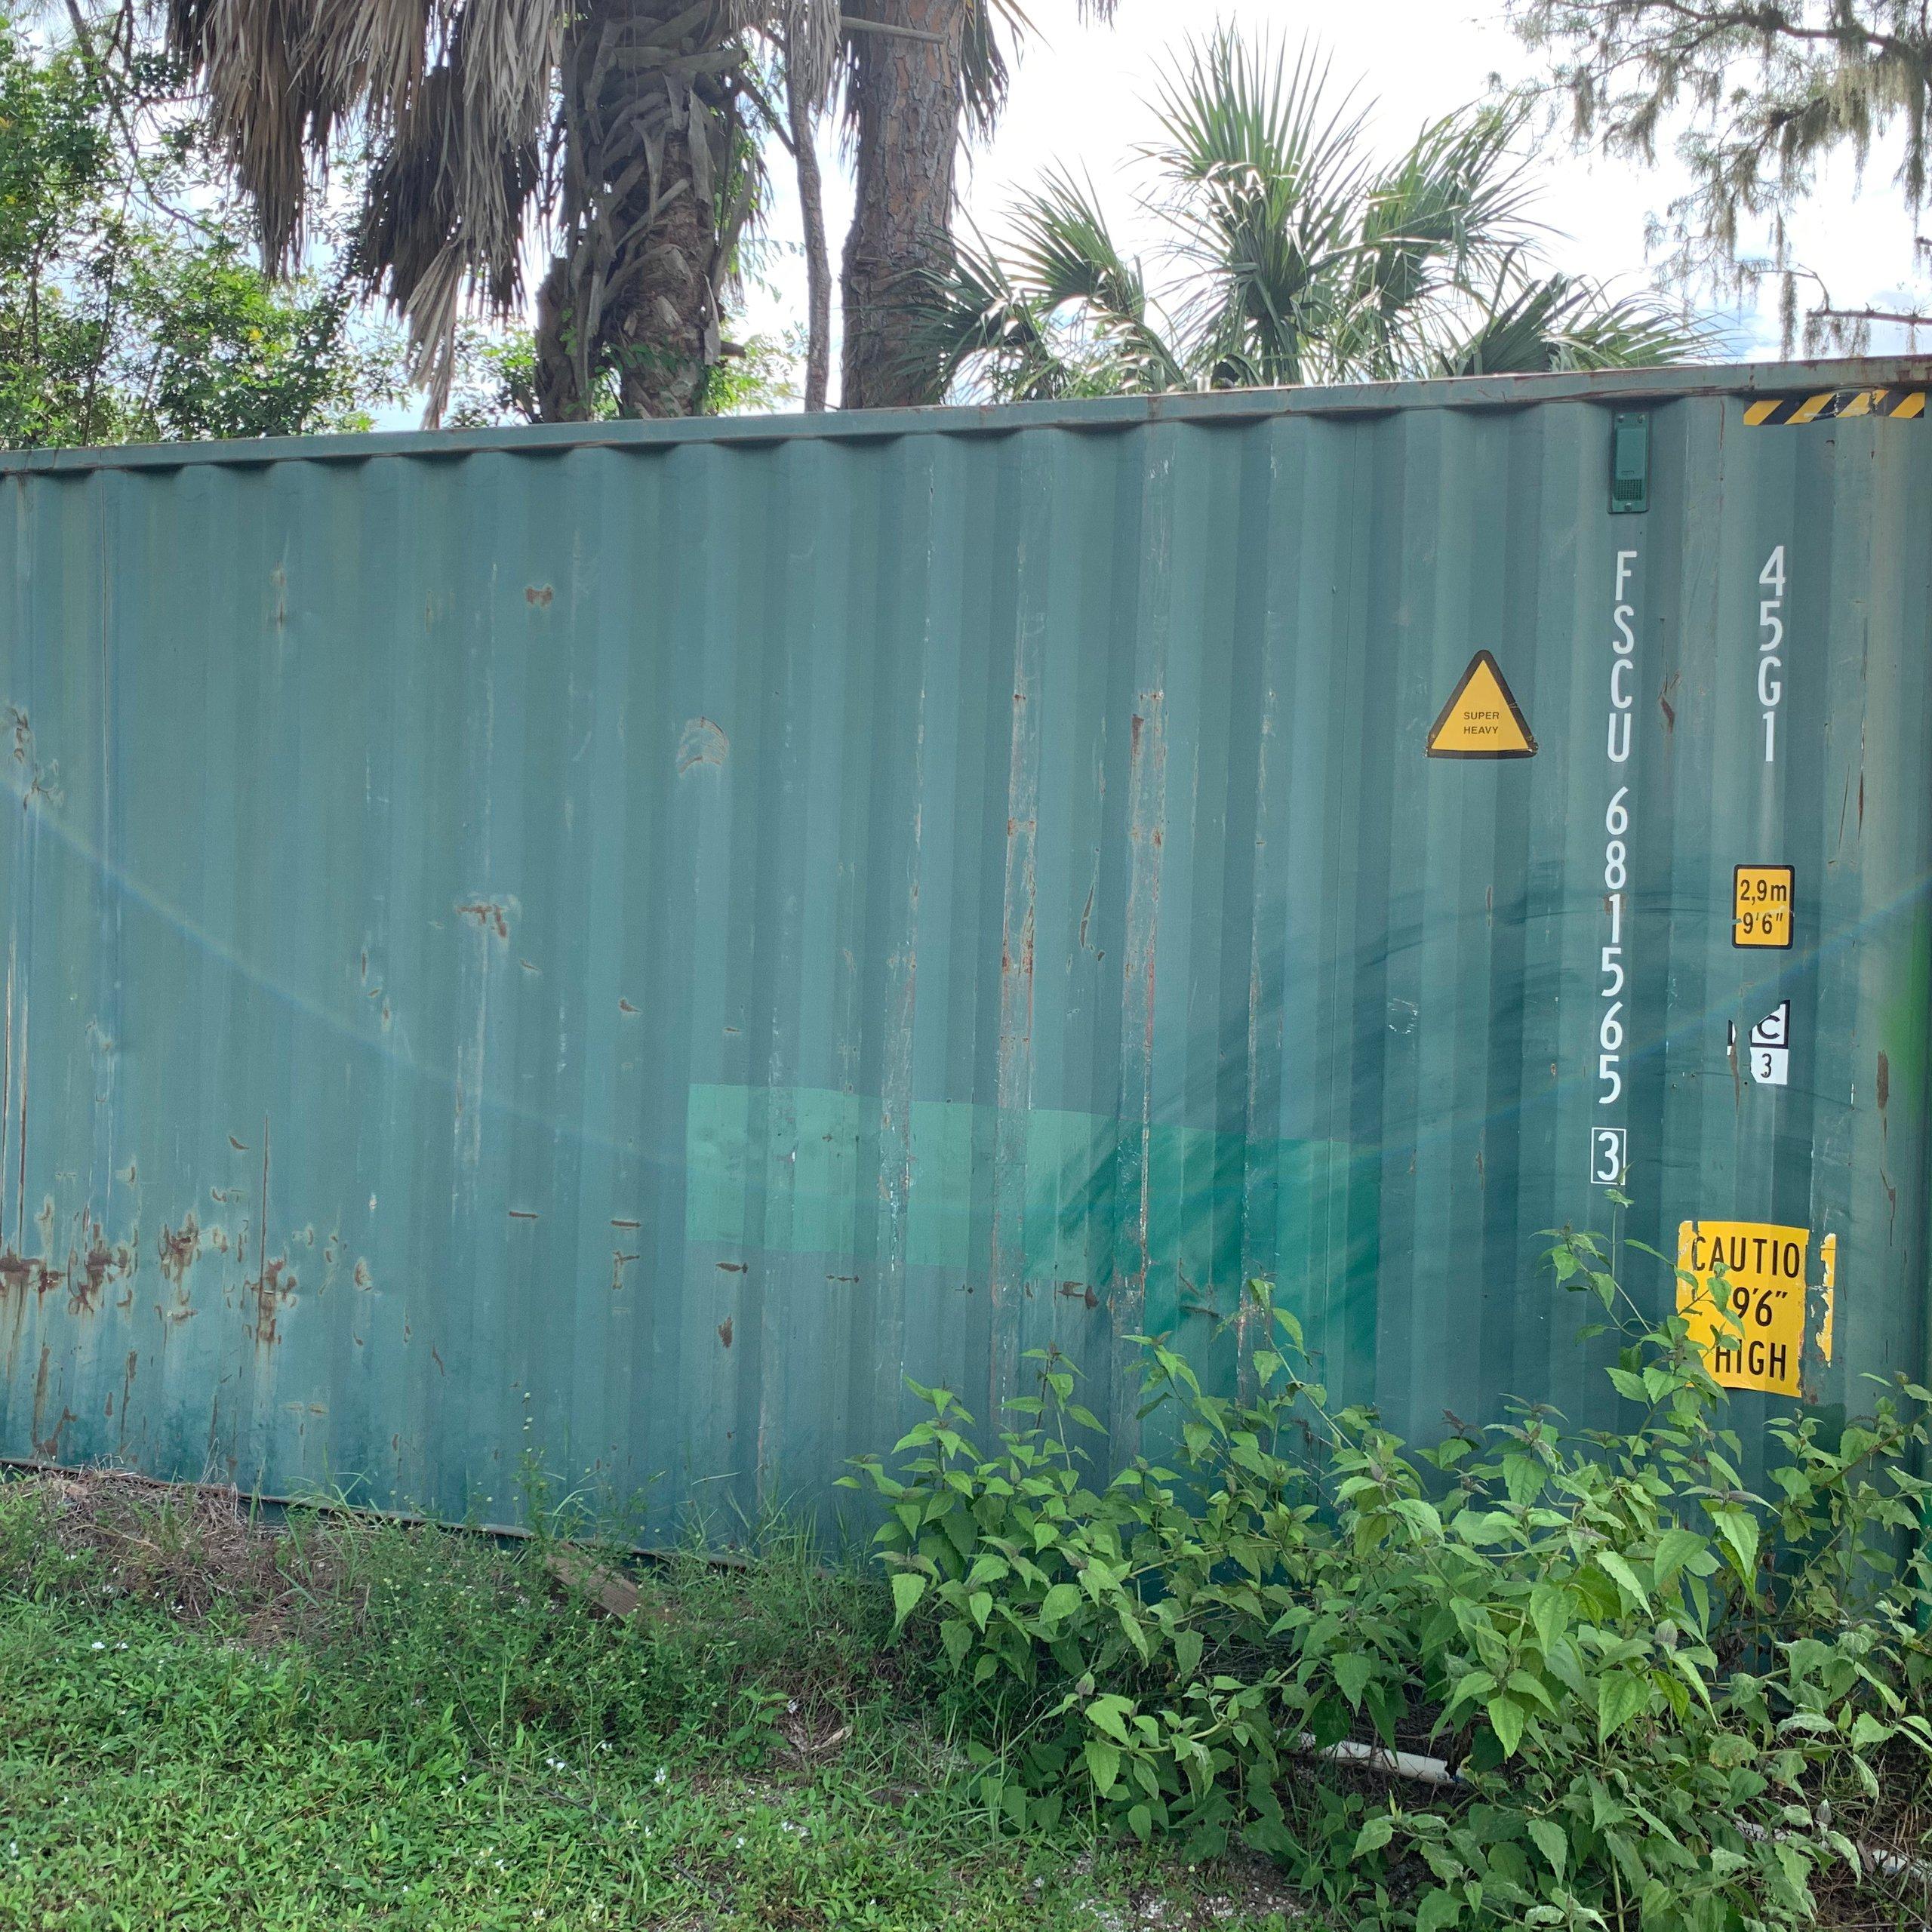 200x150 Unpaved Lot self storage unit